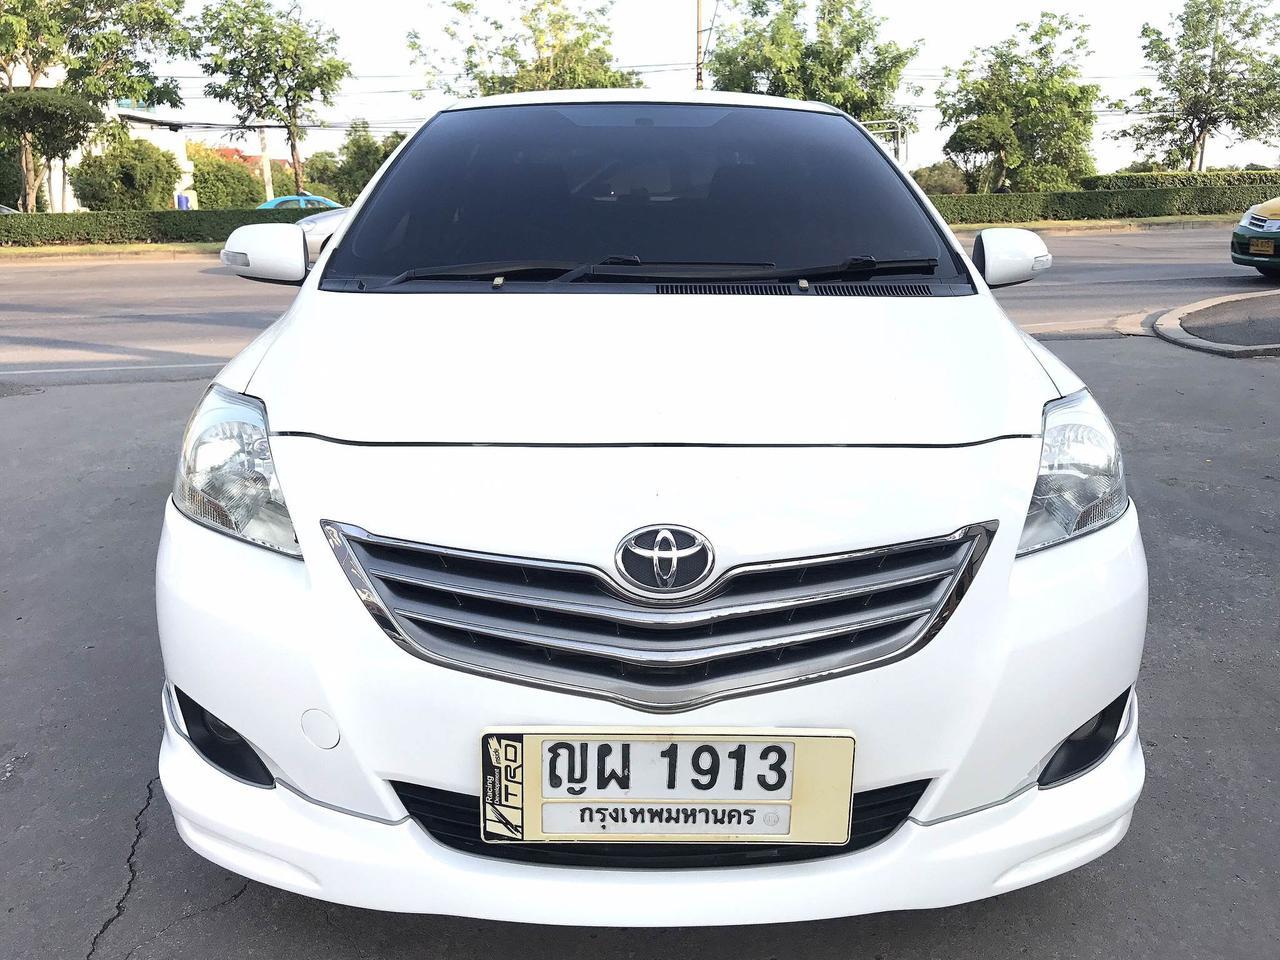 TOYOTA VIOS 1.5G Auto ปี2011 สีขาว รถบ้านมือเดียว รูปที่ 2